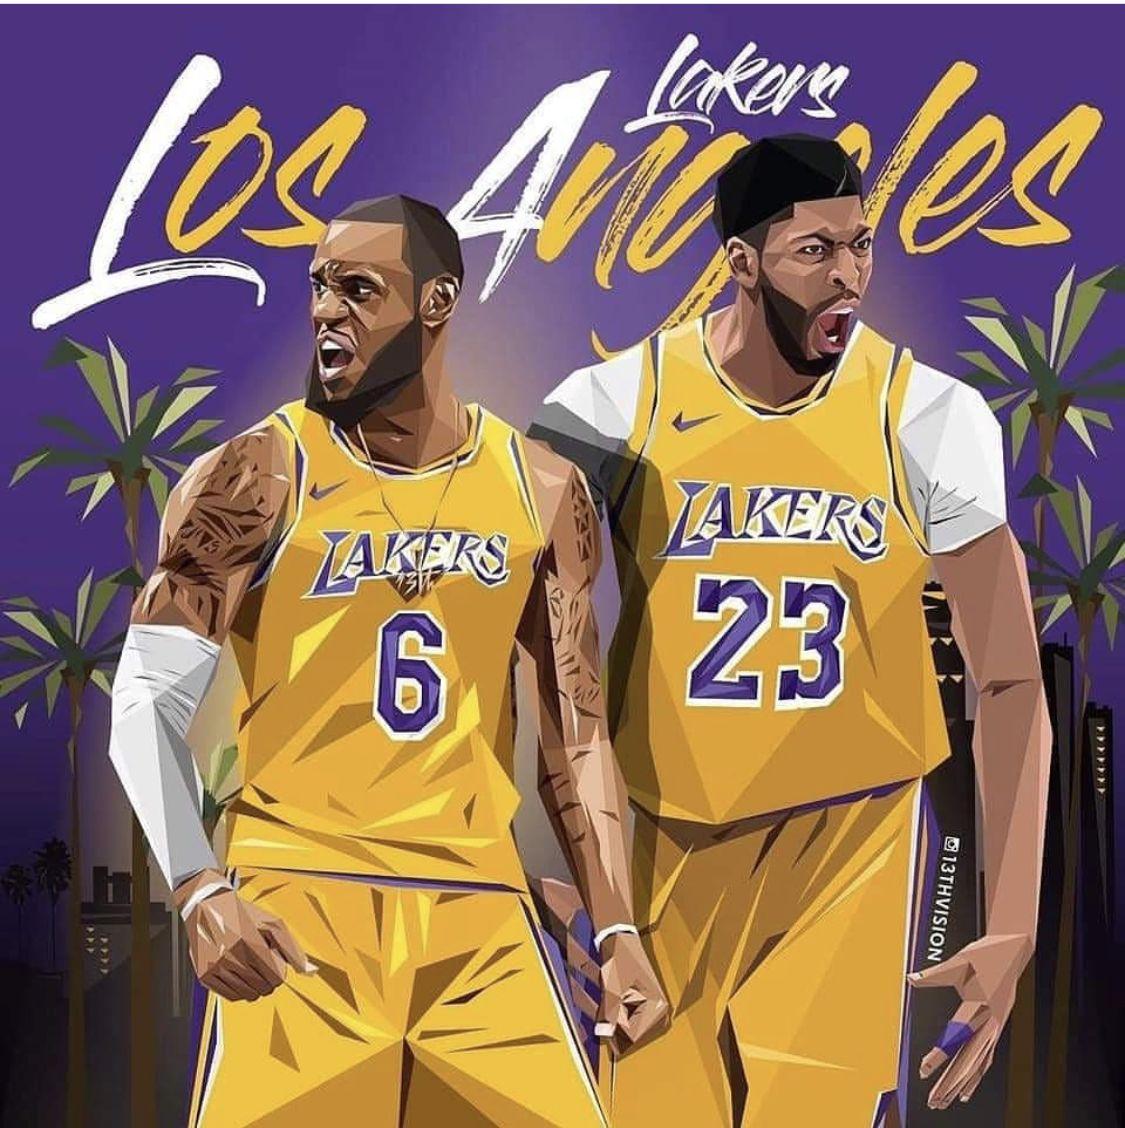 Pin By John Hernandez On Lakers Nba Basketball Art Nba Artwork Nba Mvp